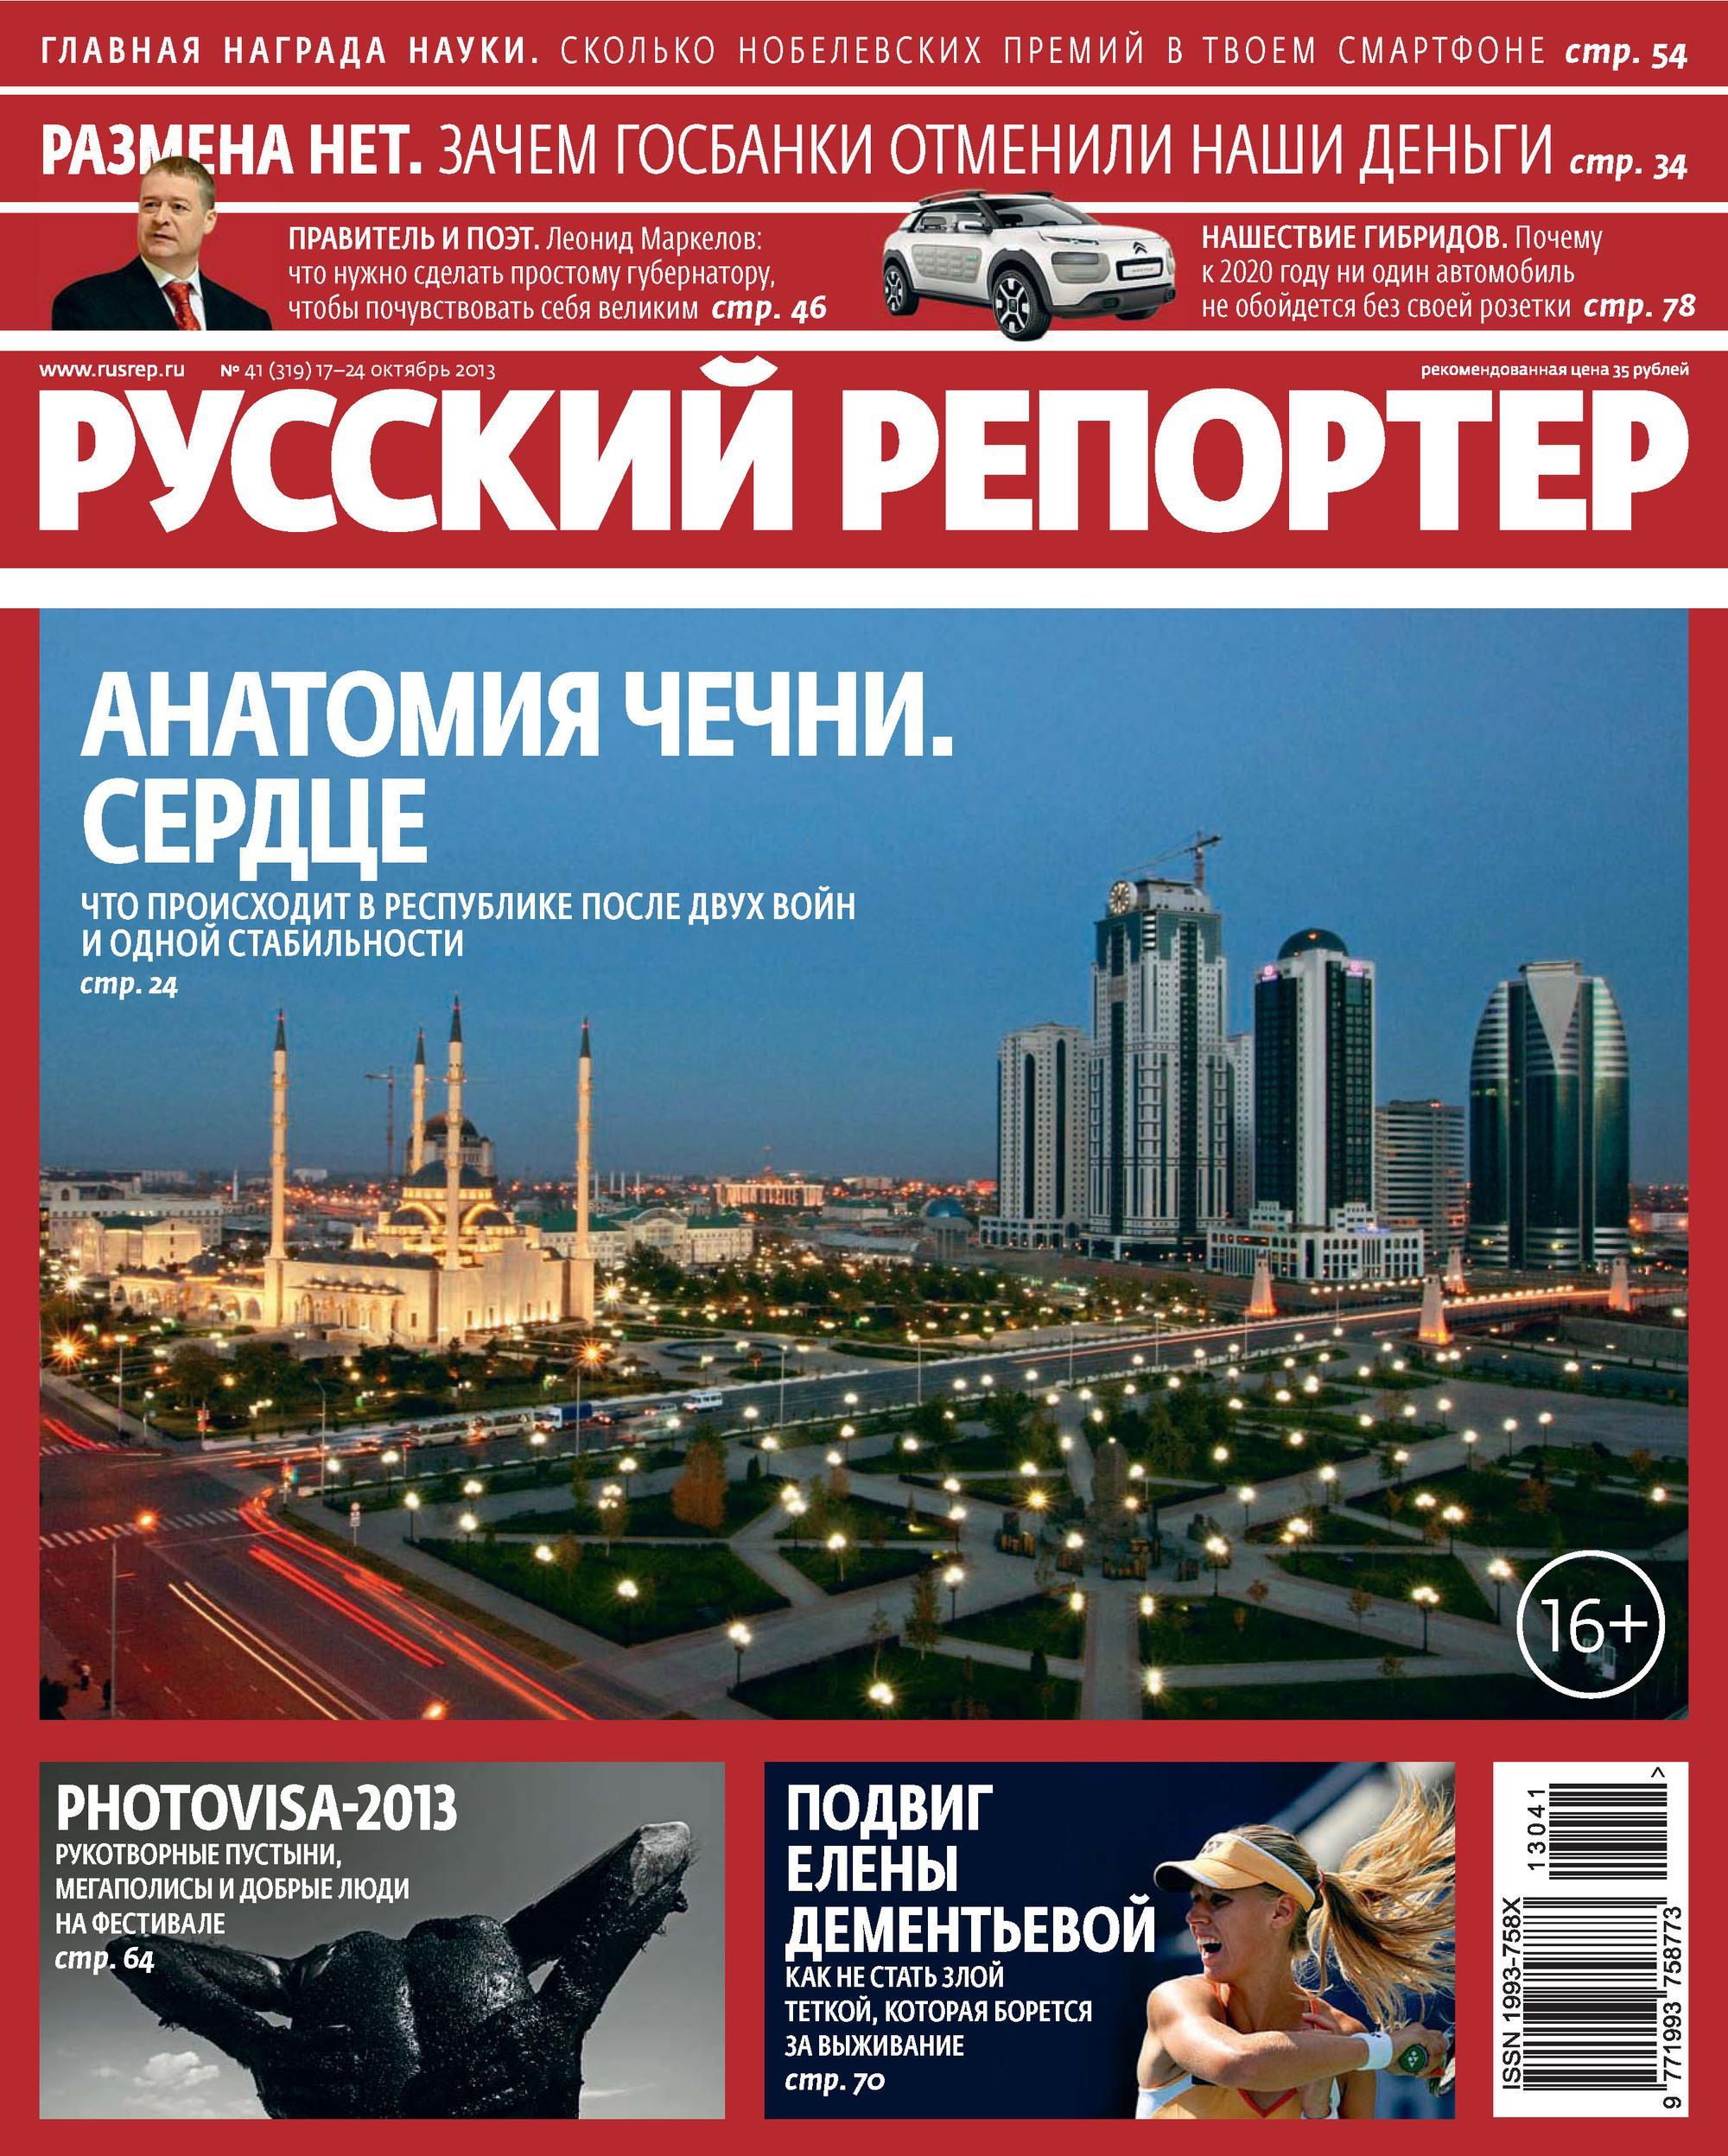 Русский Репортер № 41/2013